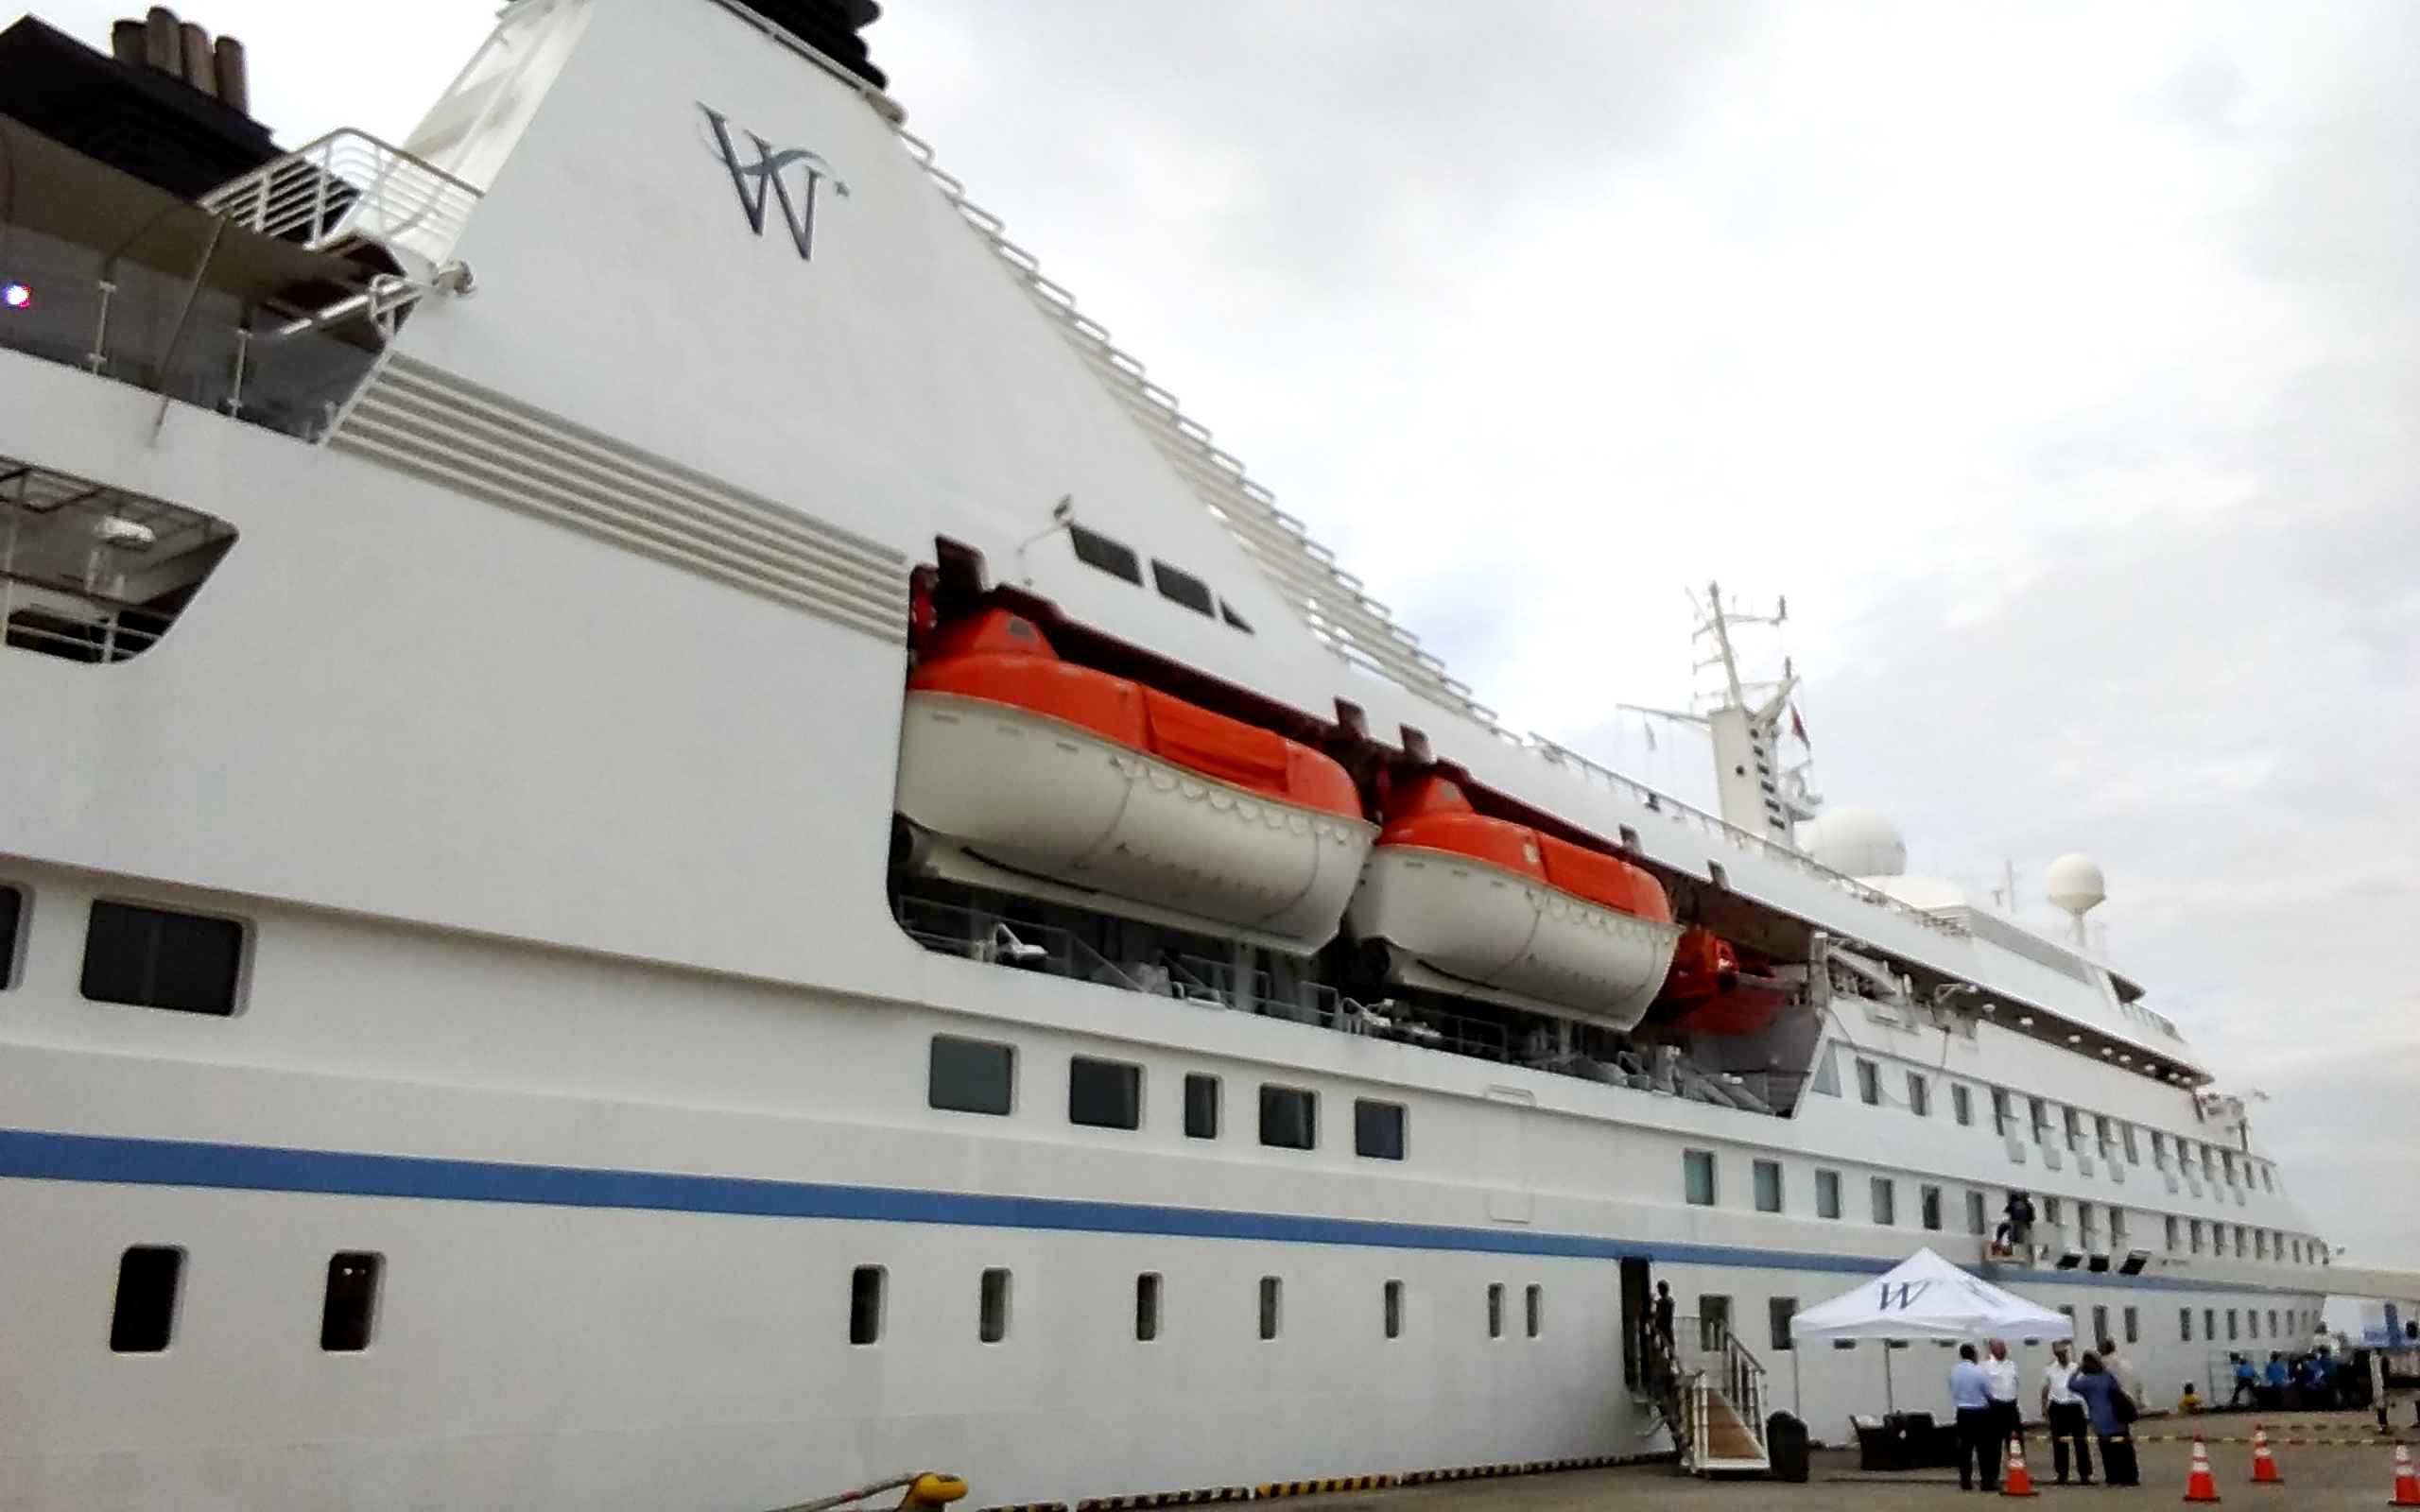 GWに日本へ入港したLuxury Cruise 紹介 ~ STAR LEGEND編 ~